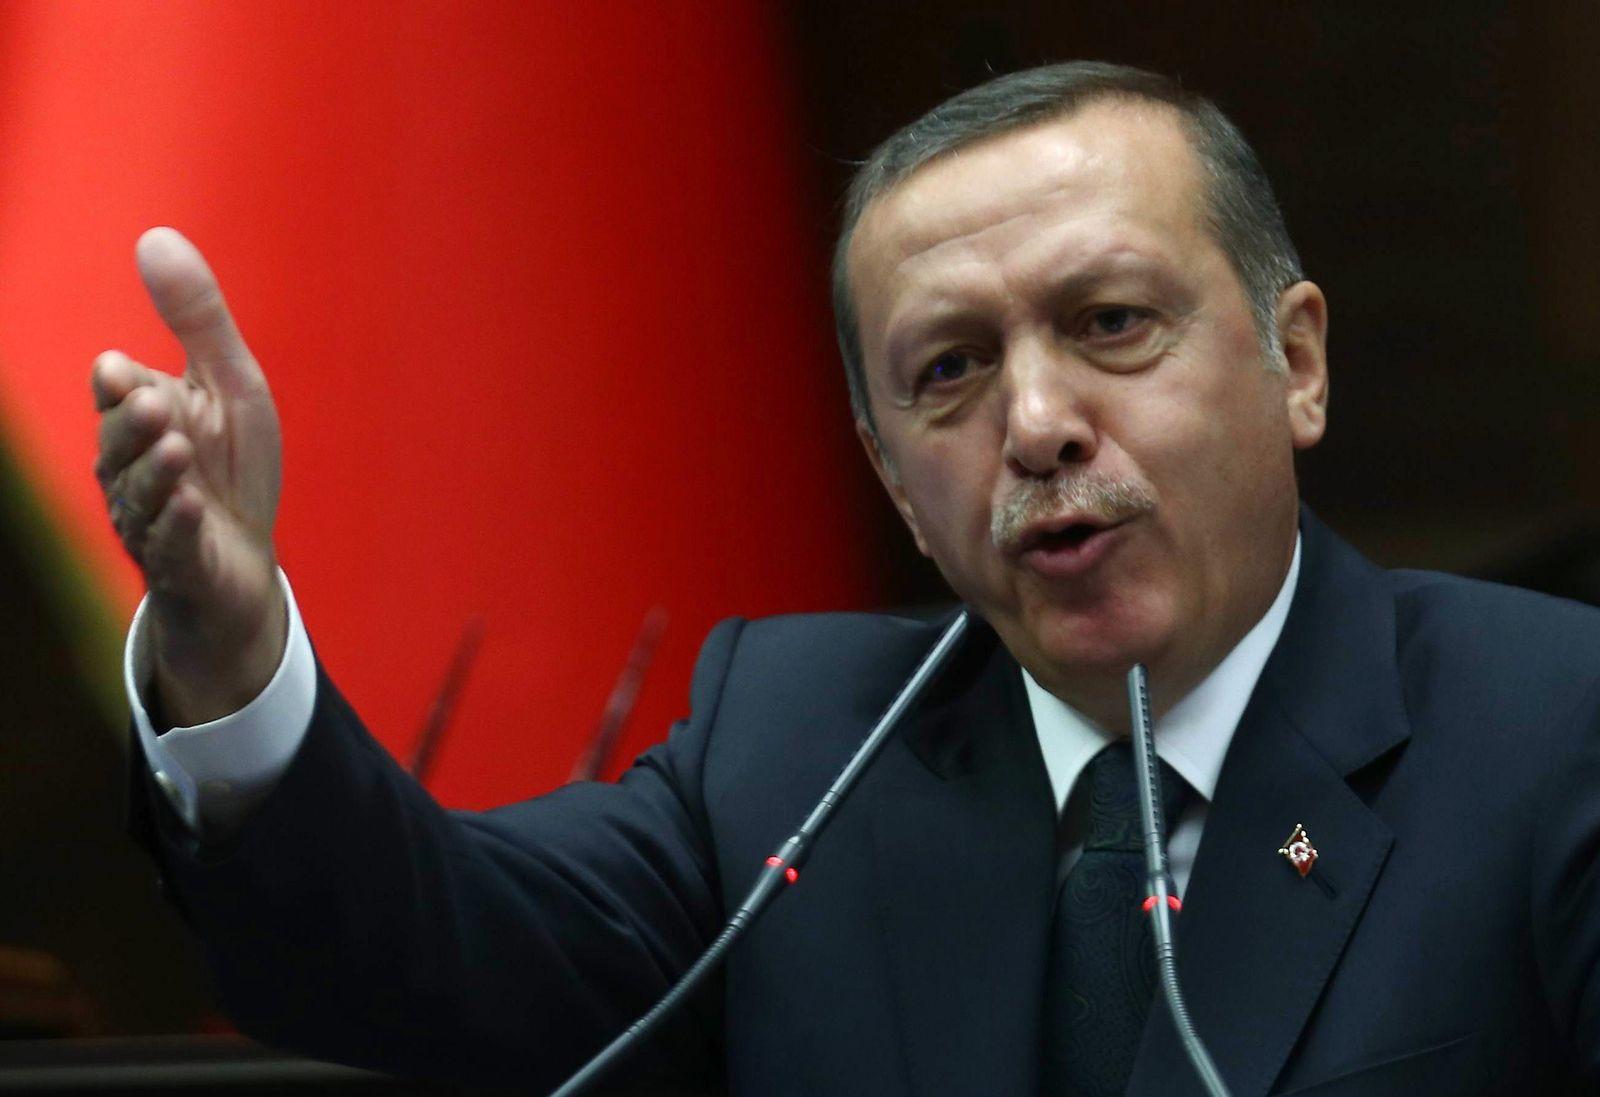 TURKEY-AKP-PARLIAMENT